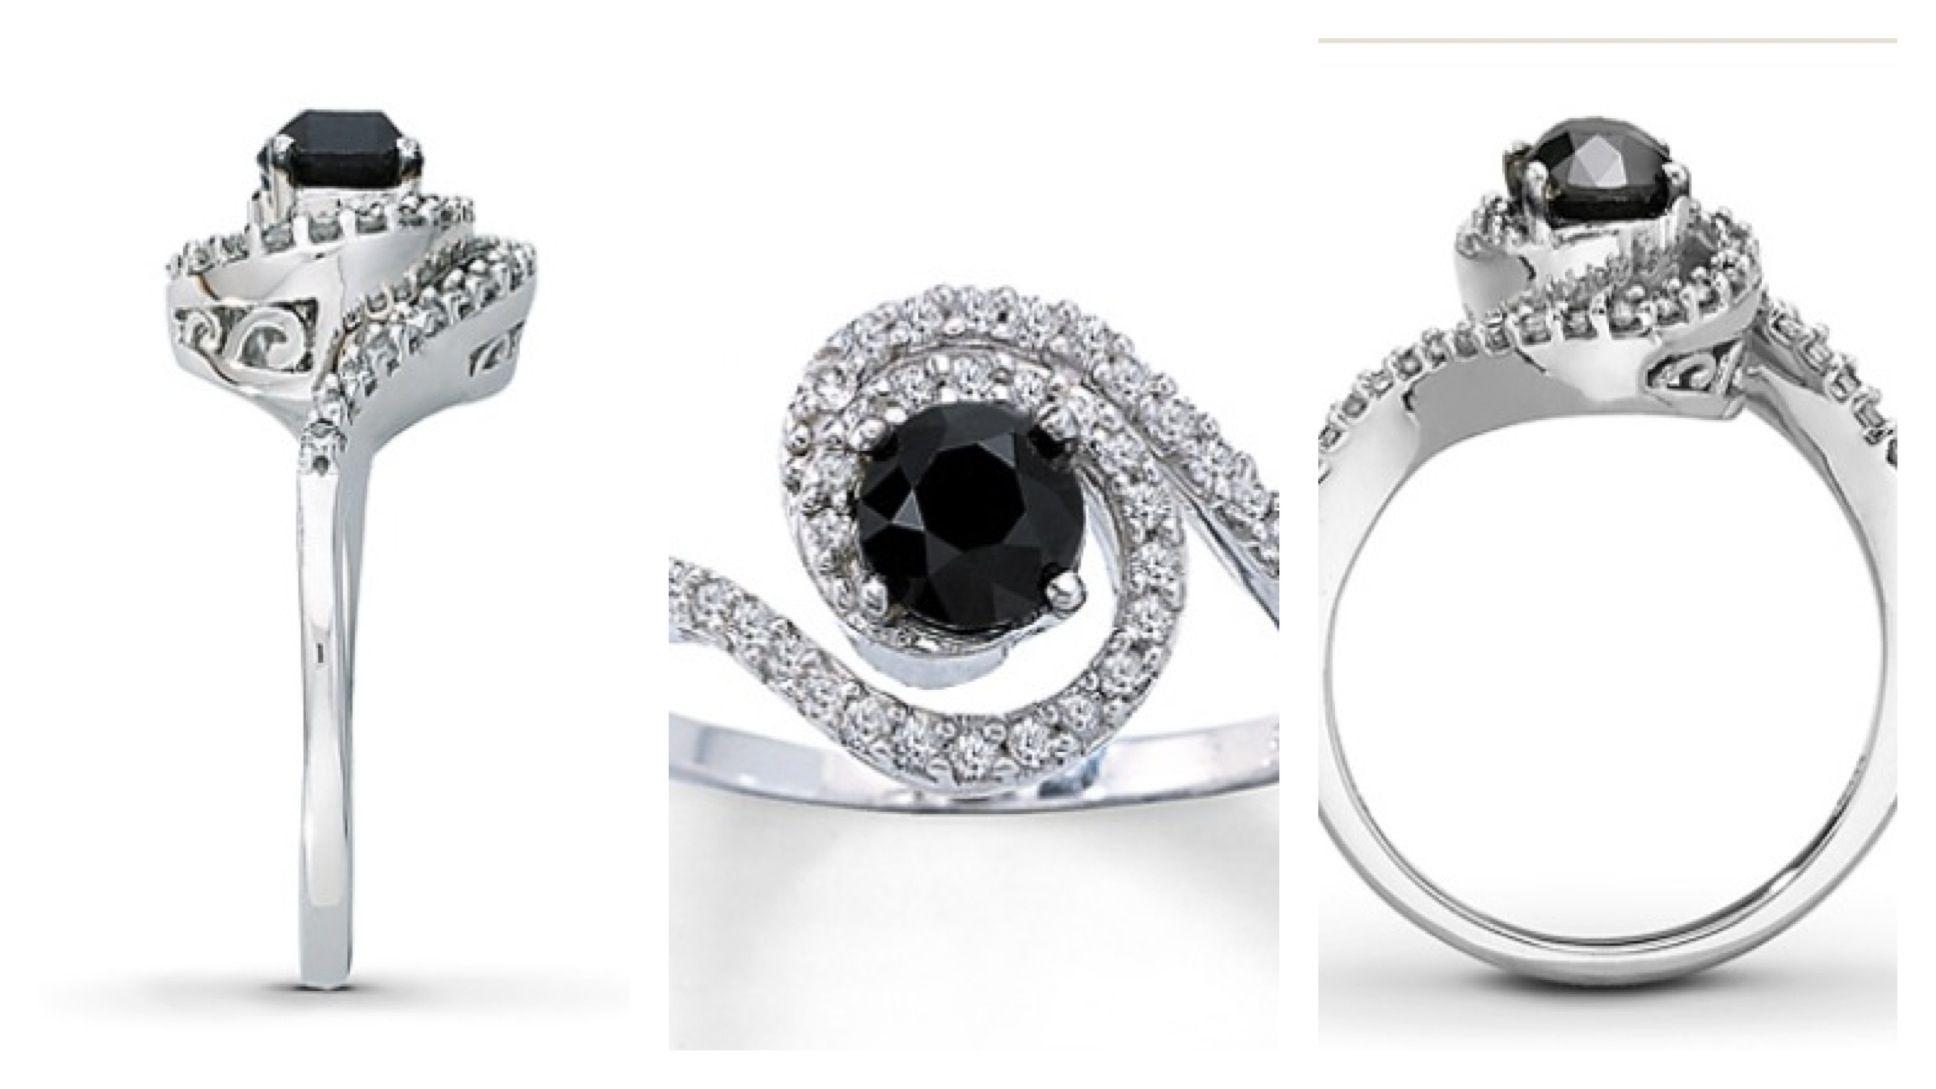 My wedding ring!